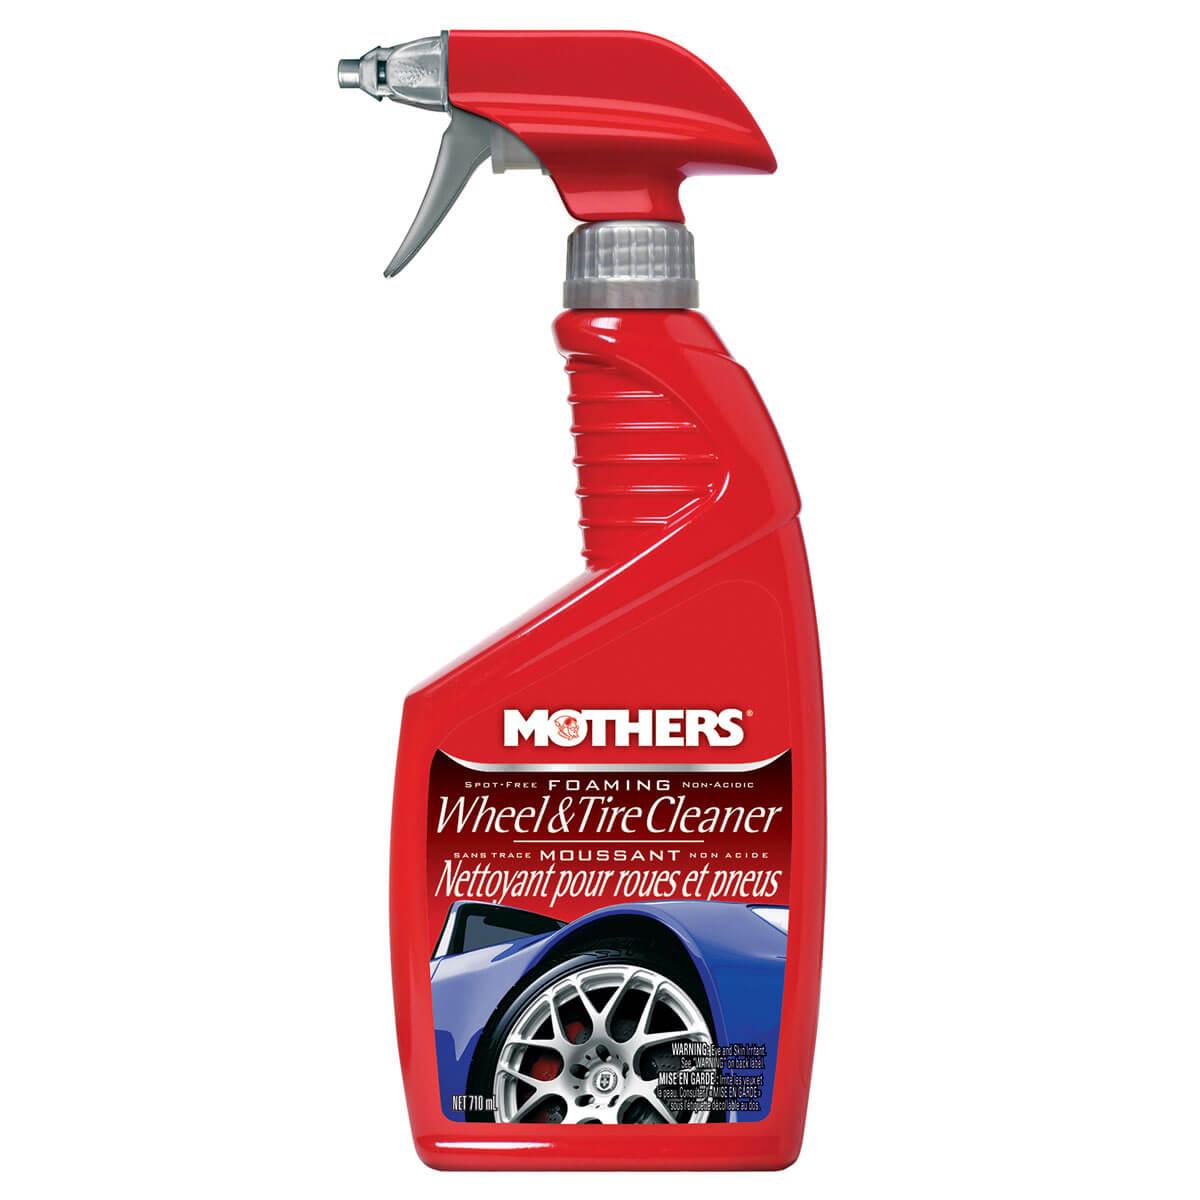 Foaming Wheel & Tire Cleaner - 24oz